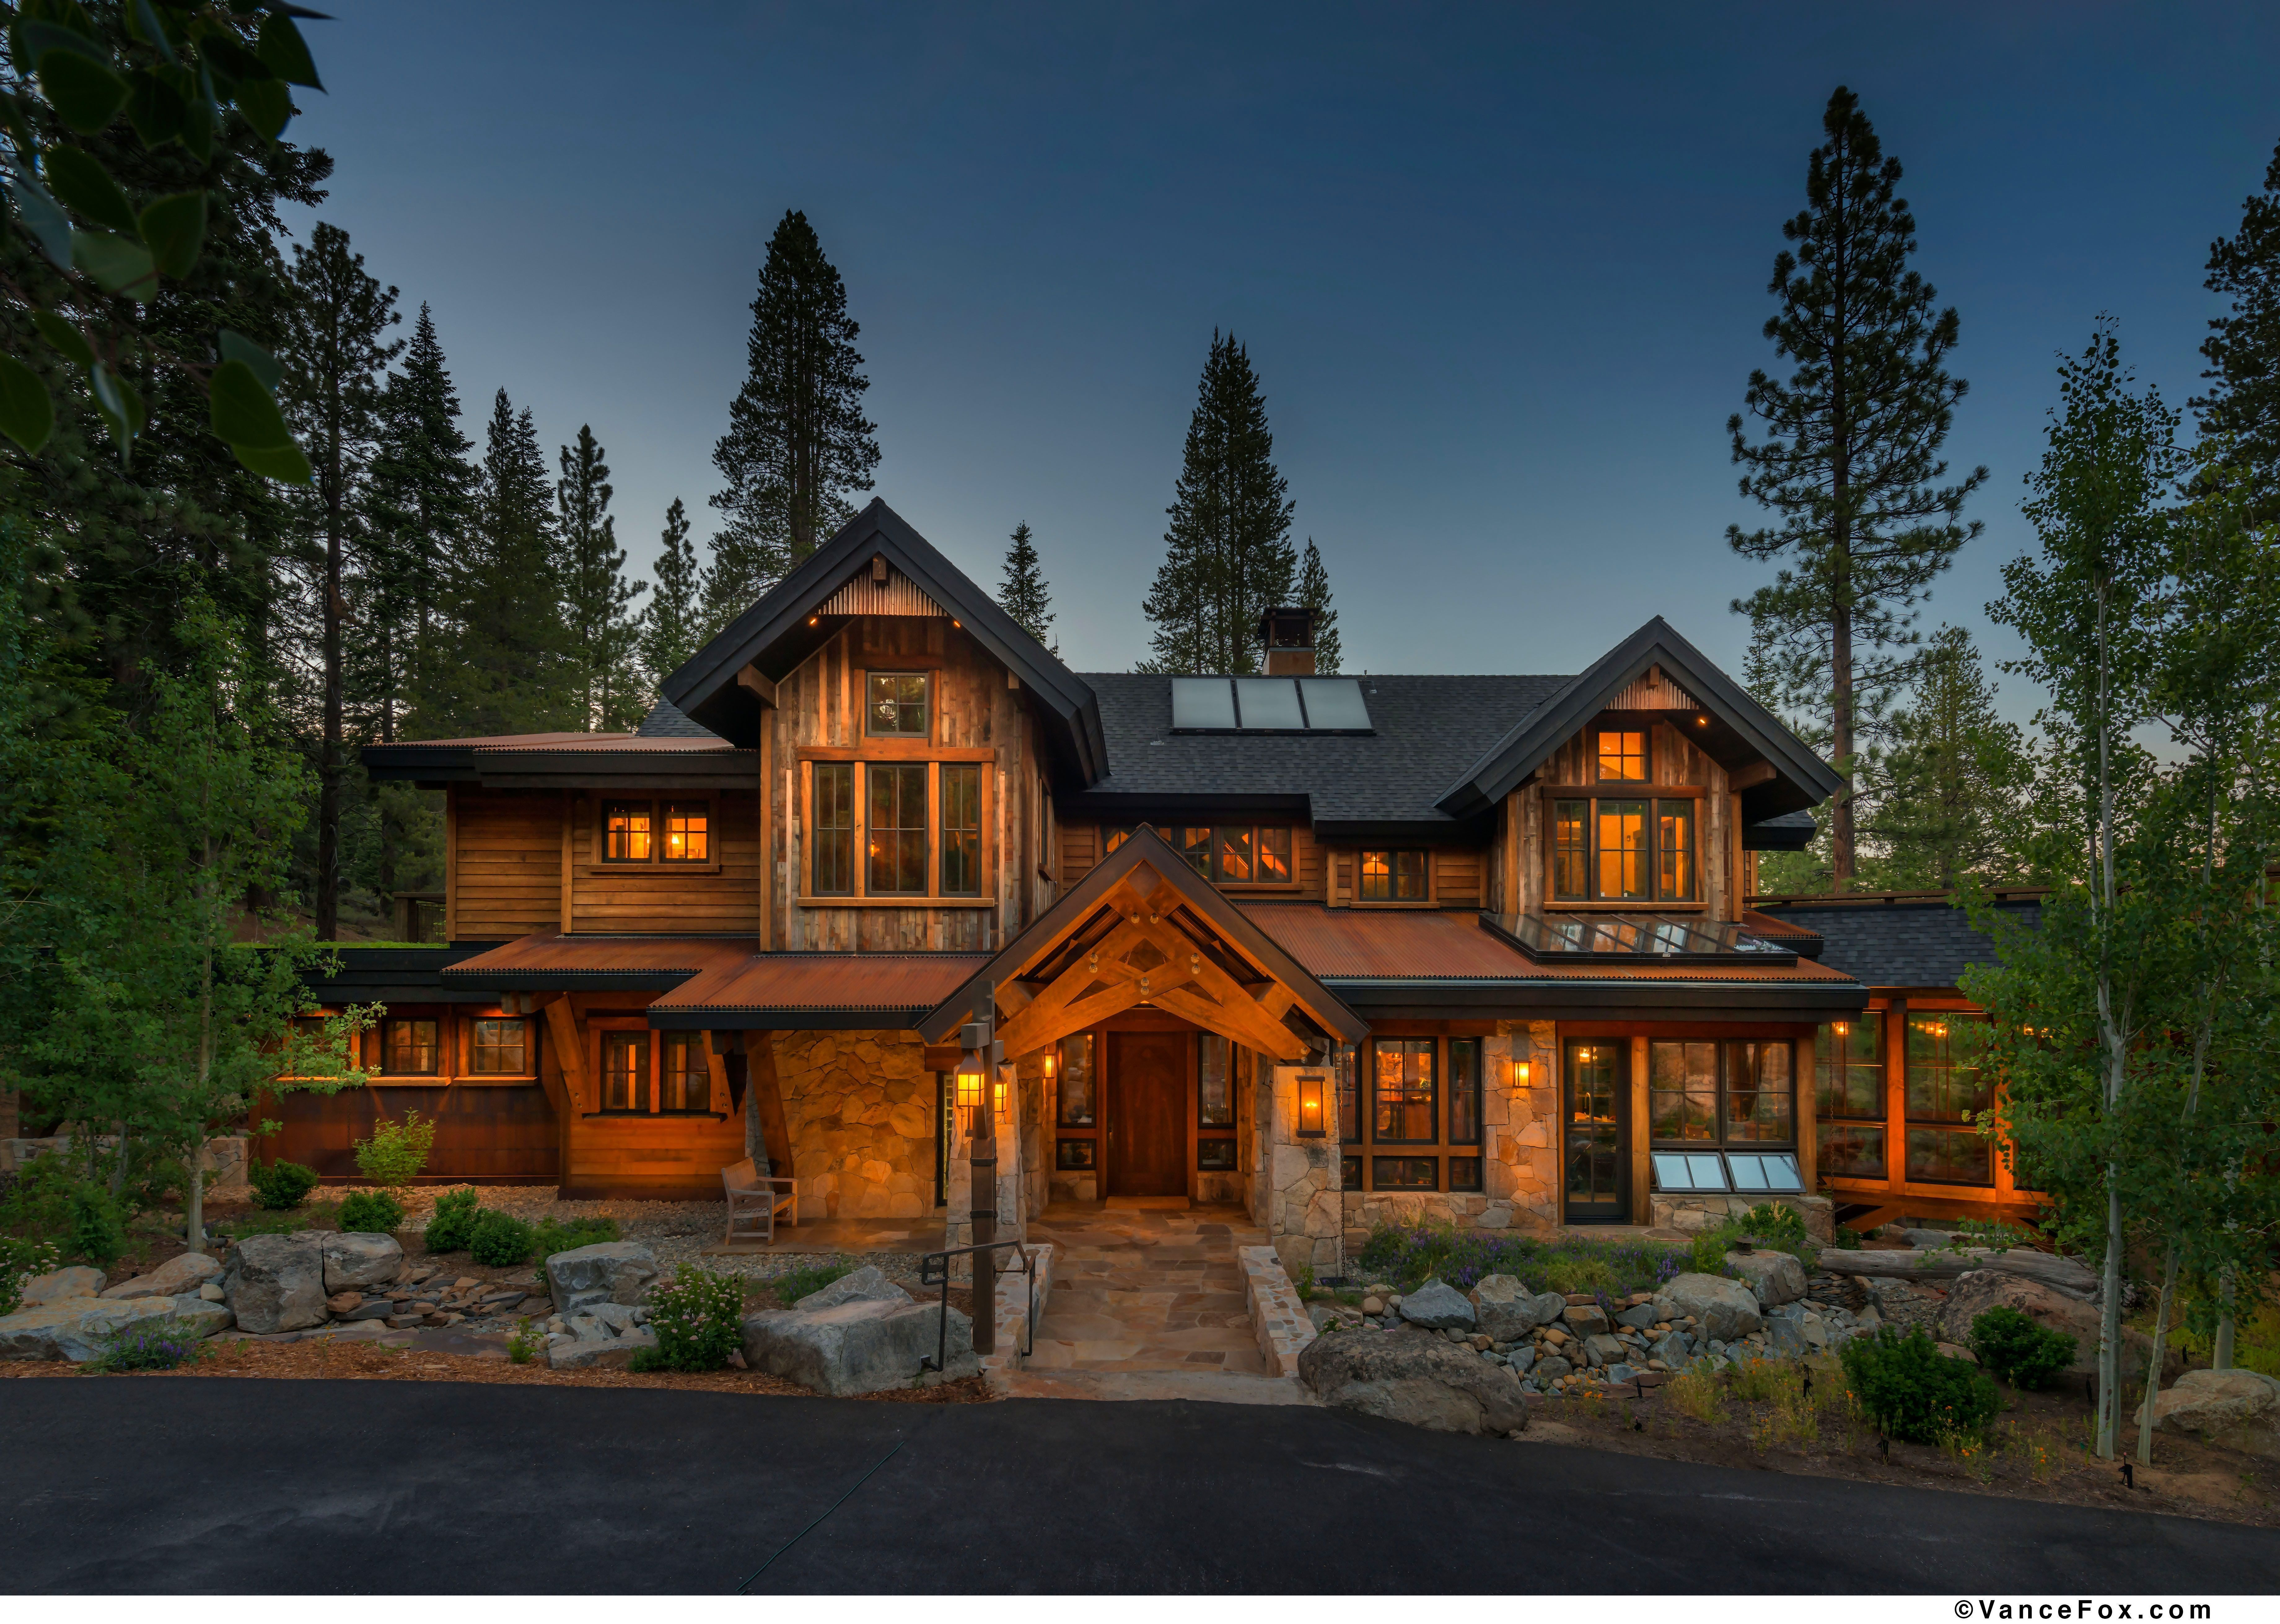 Pin By Gargaryon On Exterior Ideas House Styles Courtyard Design House Design